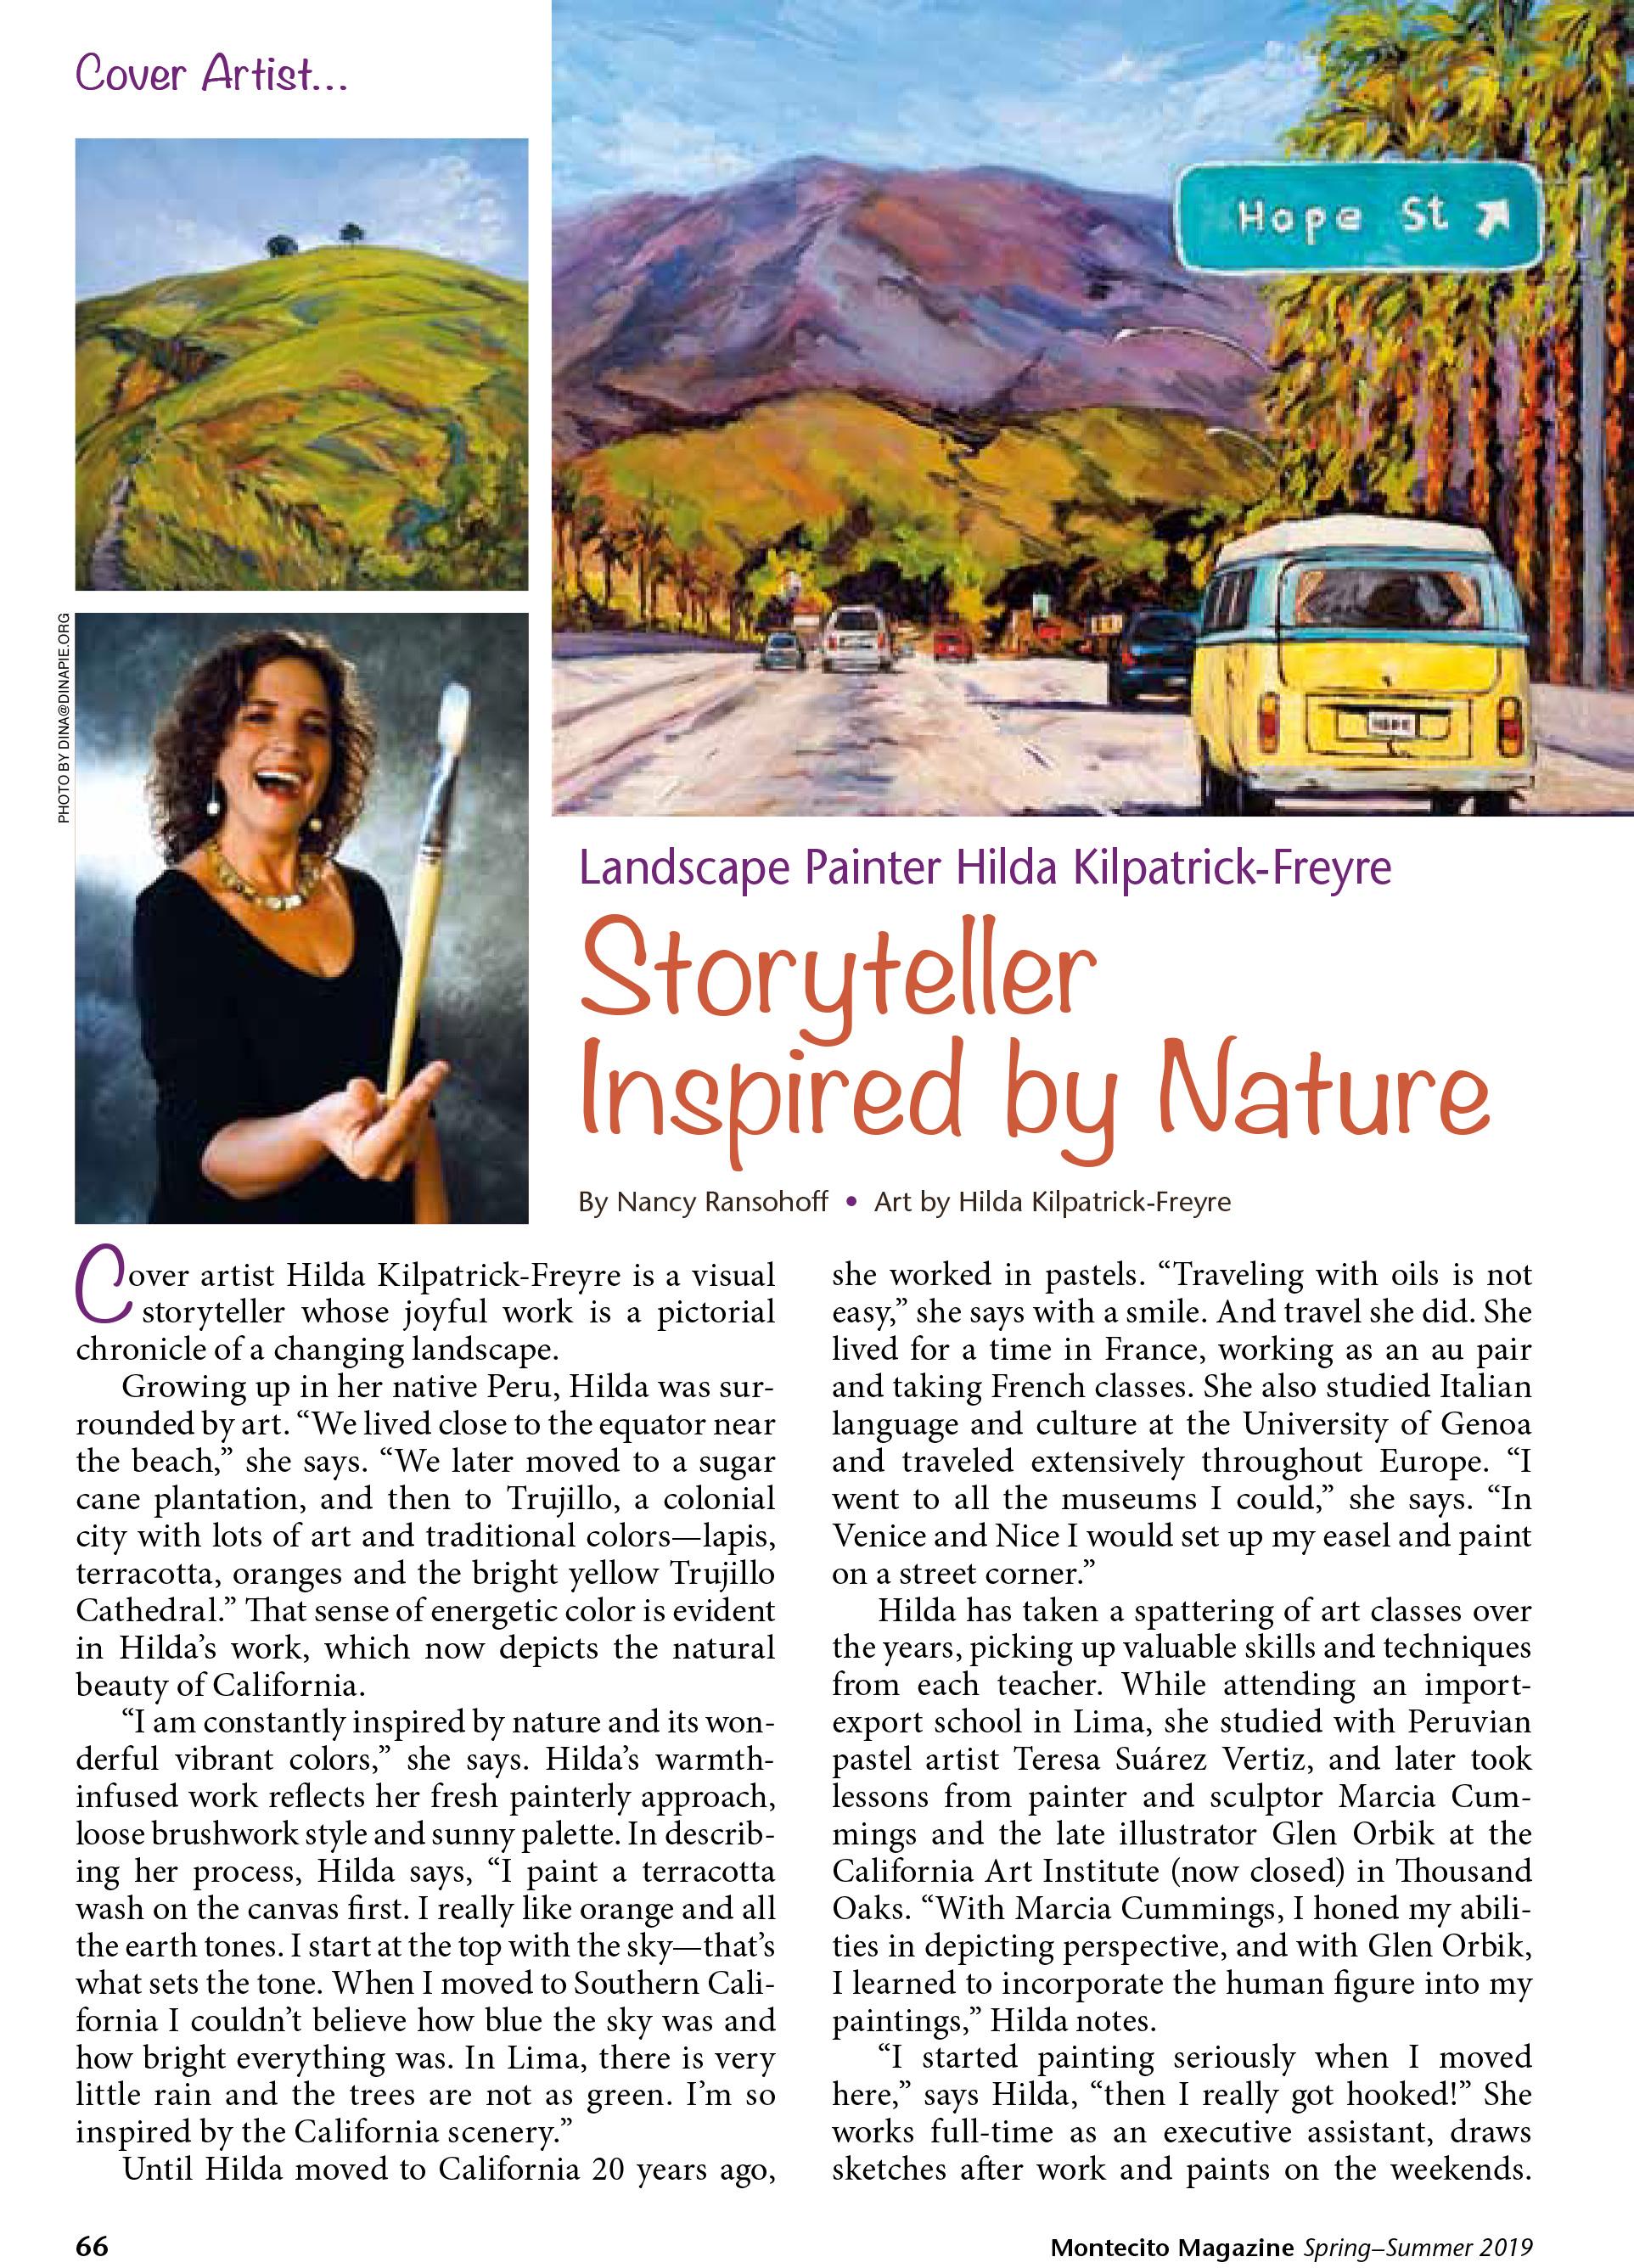 Montecito Magazine, Cover-Artist-Hilda-Kilpatrick